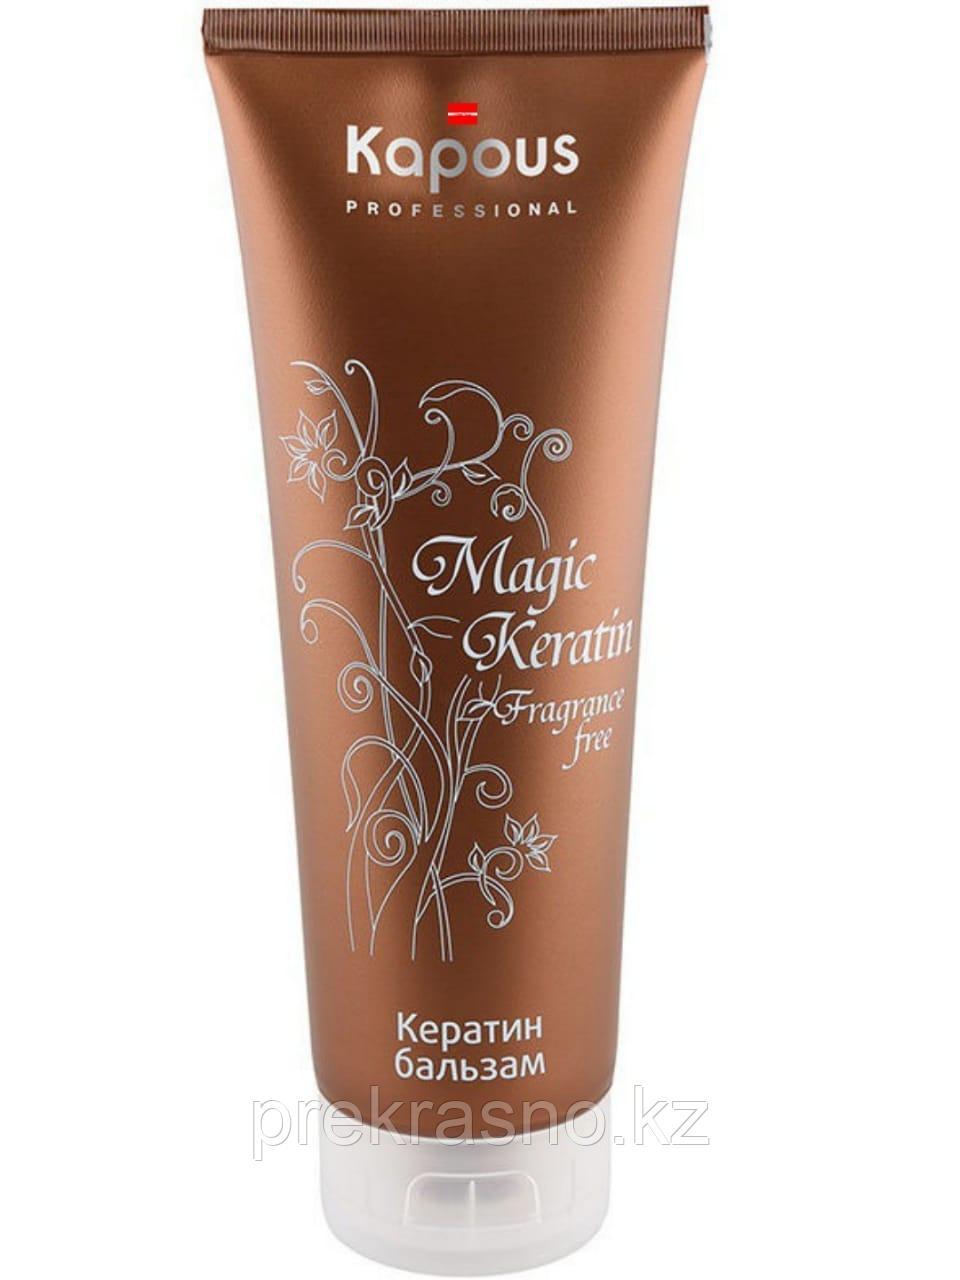 Бальзам-кератин 250мл для волос Magic Keratin Fragrance Free